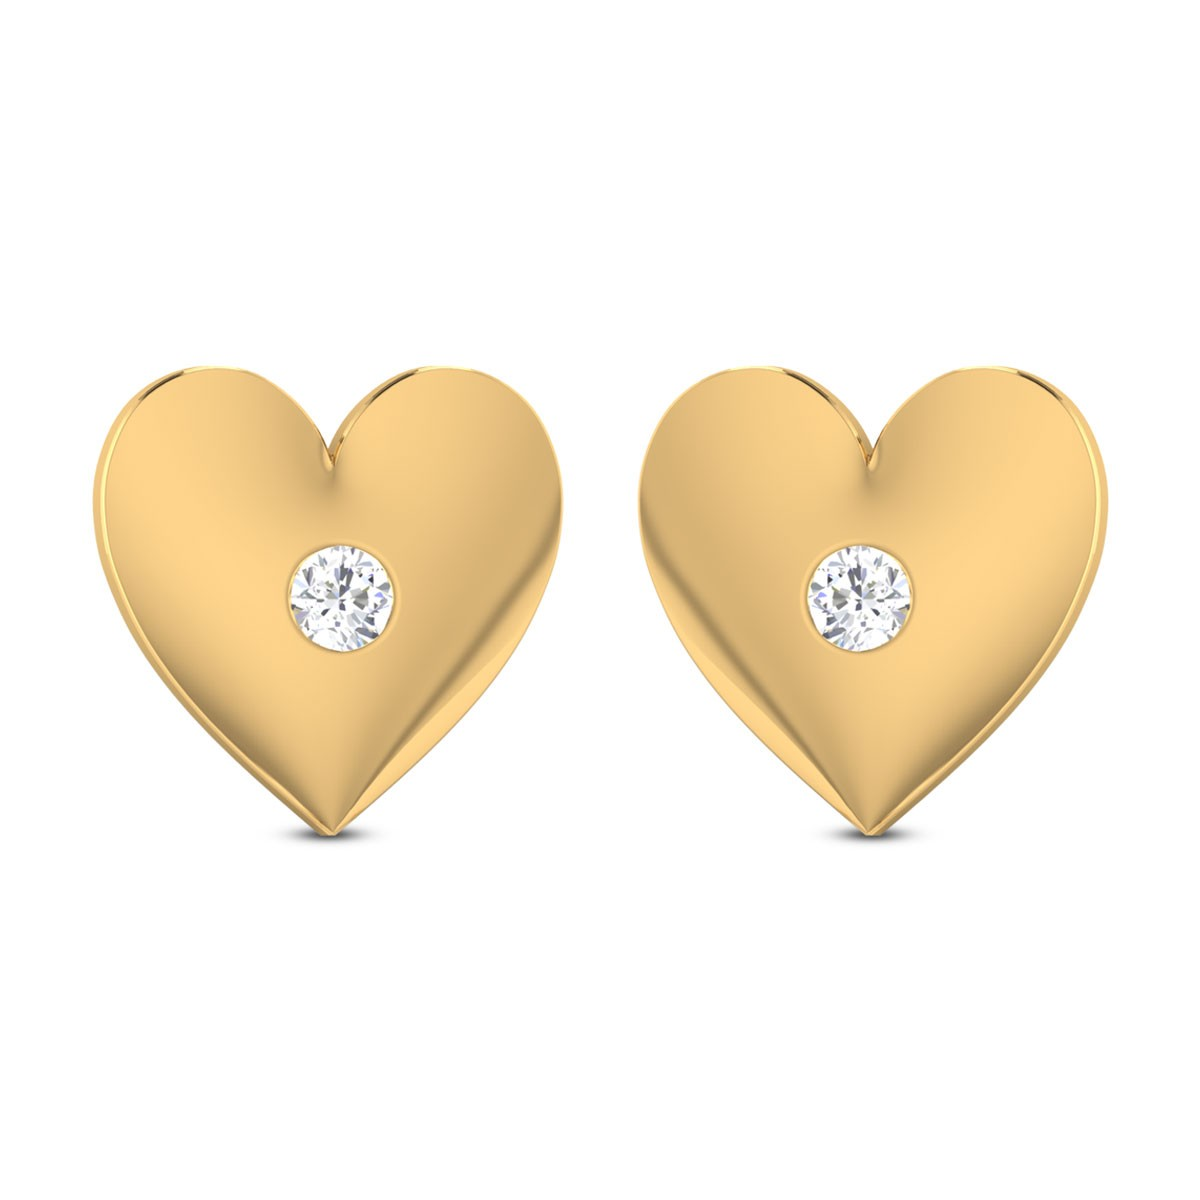 Hadleigh Heart Diamond Earrings